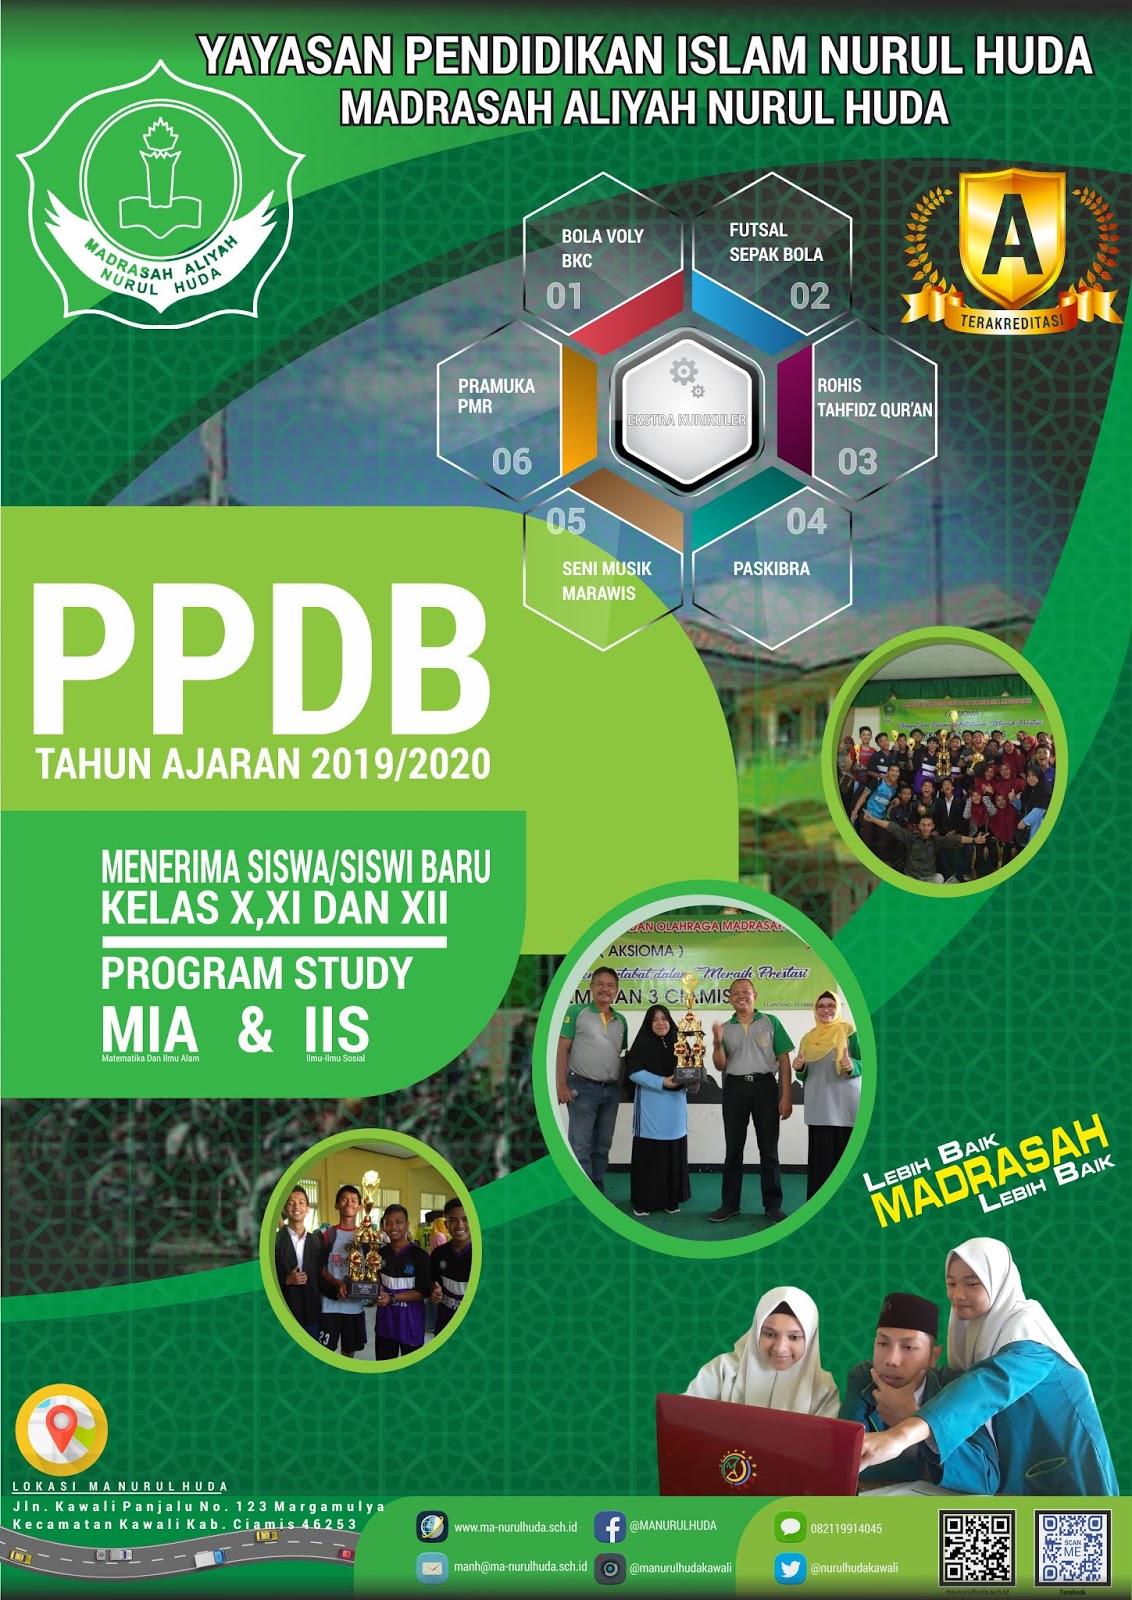 Brosur PPDB Madrasah Aliyah Nurul Huda Tahun Pelajaran 2019/2020